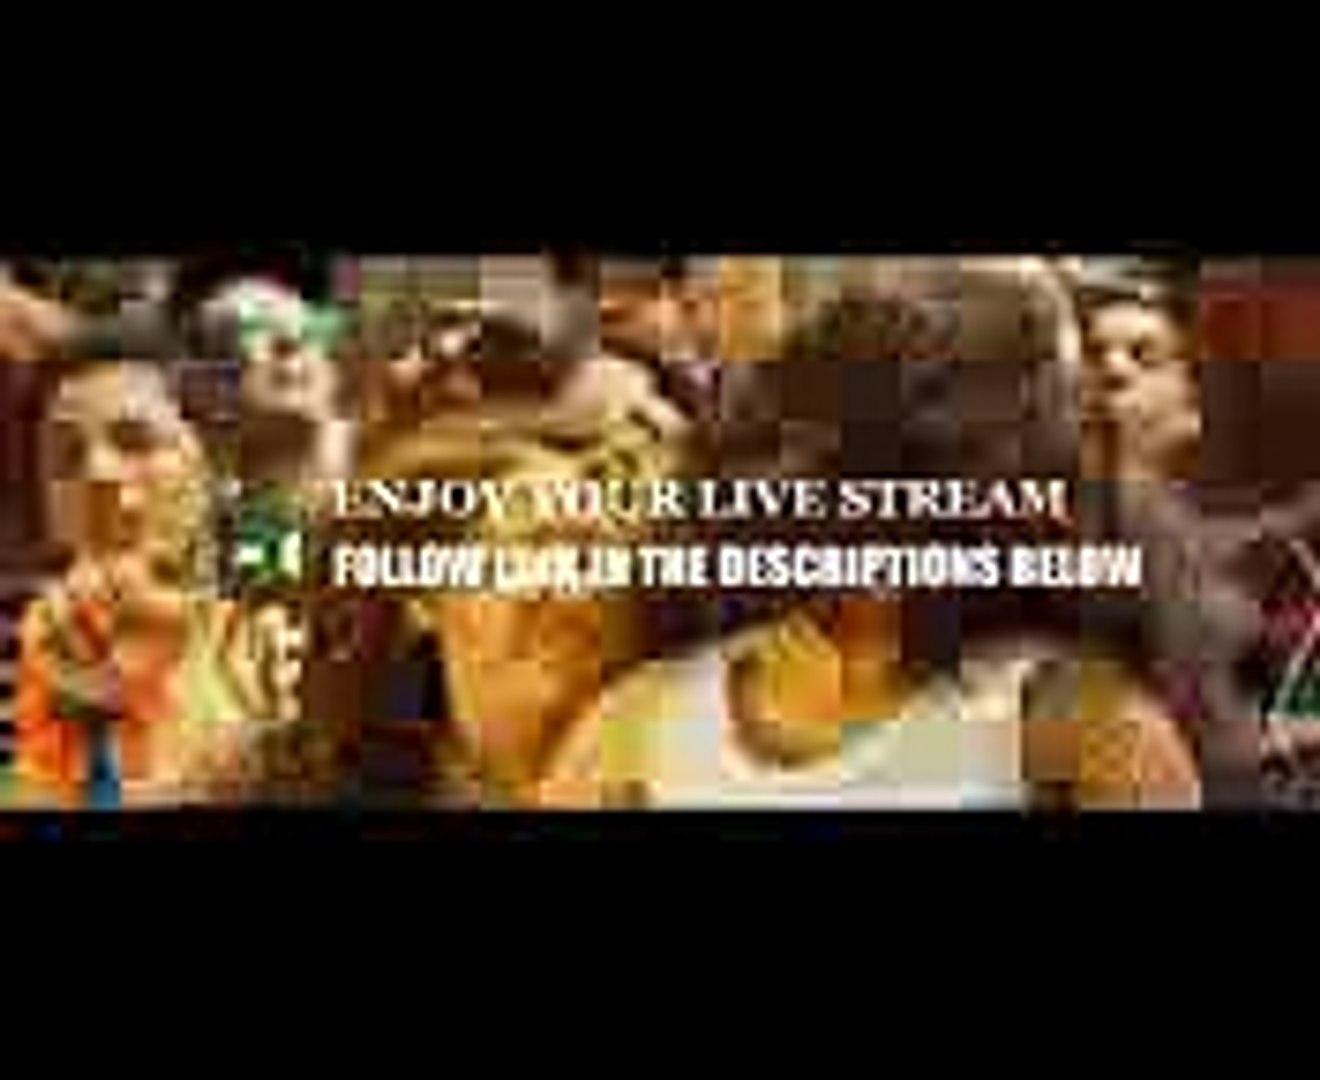 Peter Fonda - Live 107 Projects, Sydney, NSW, Australia - full concert